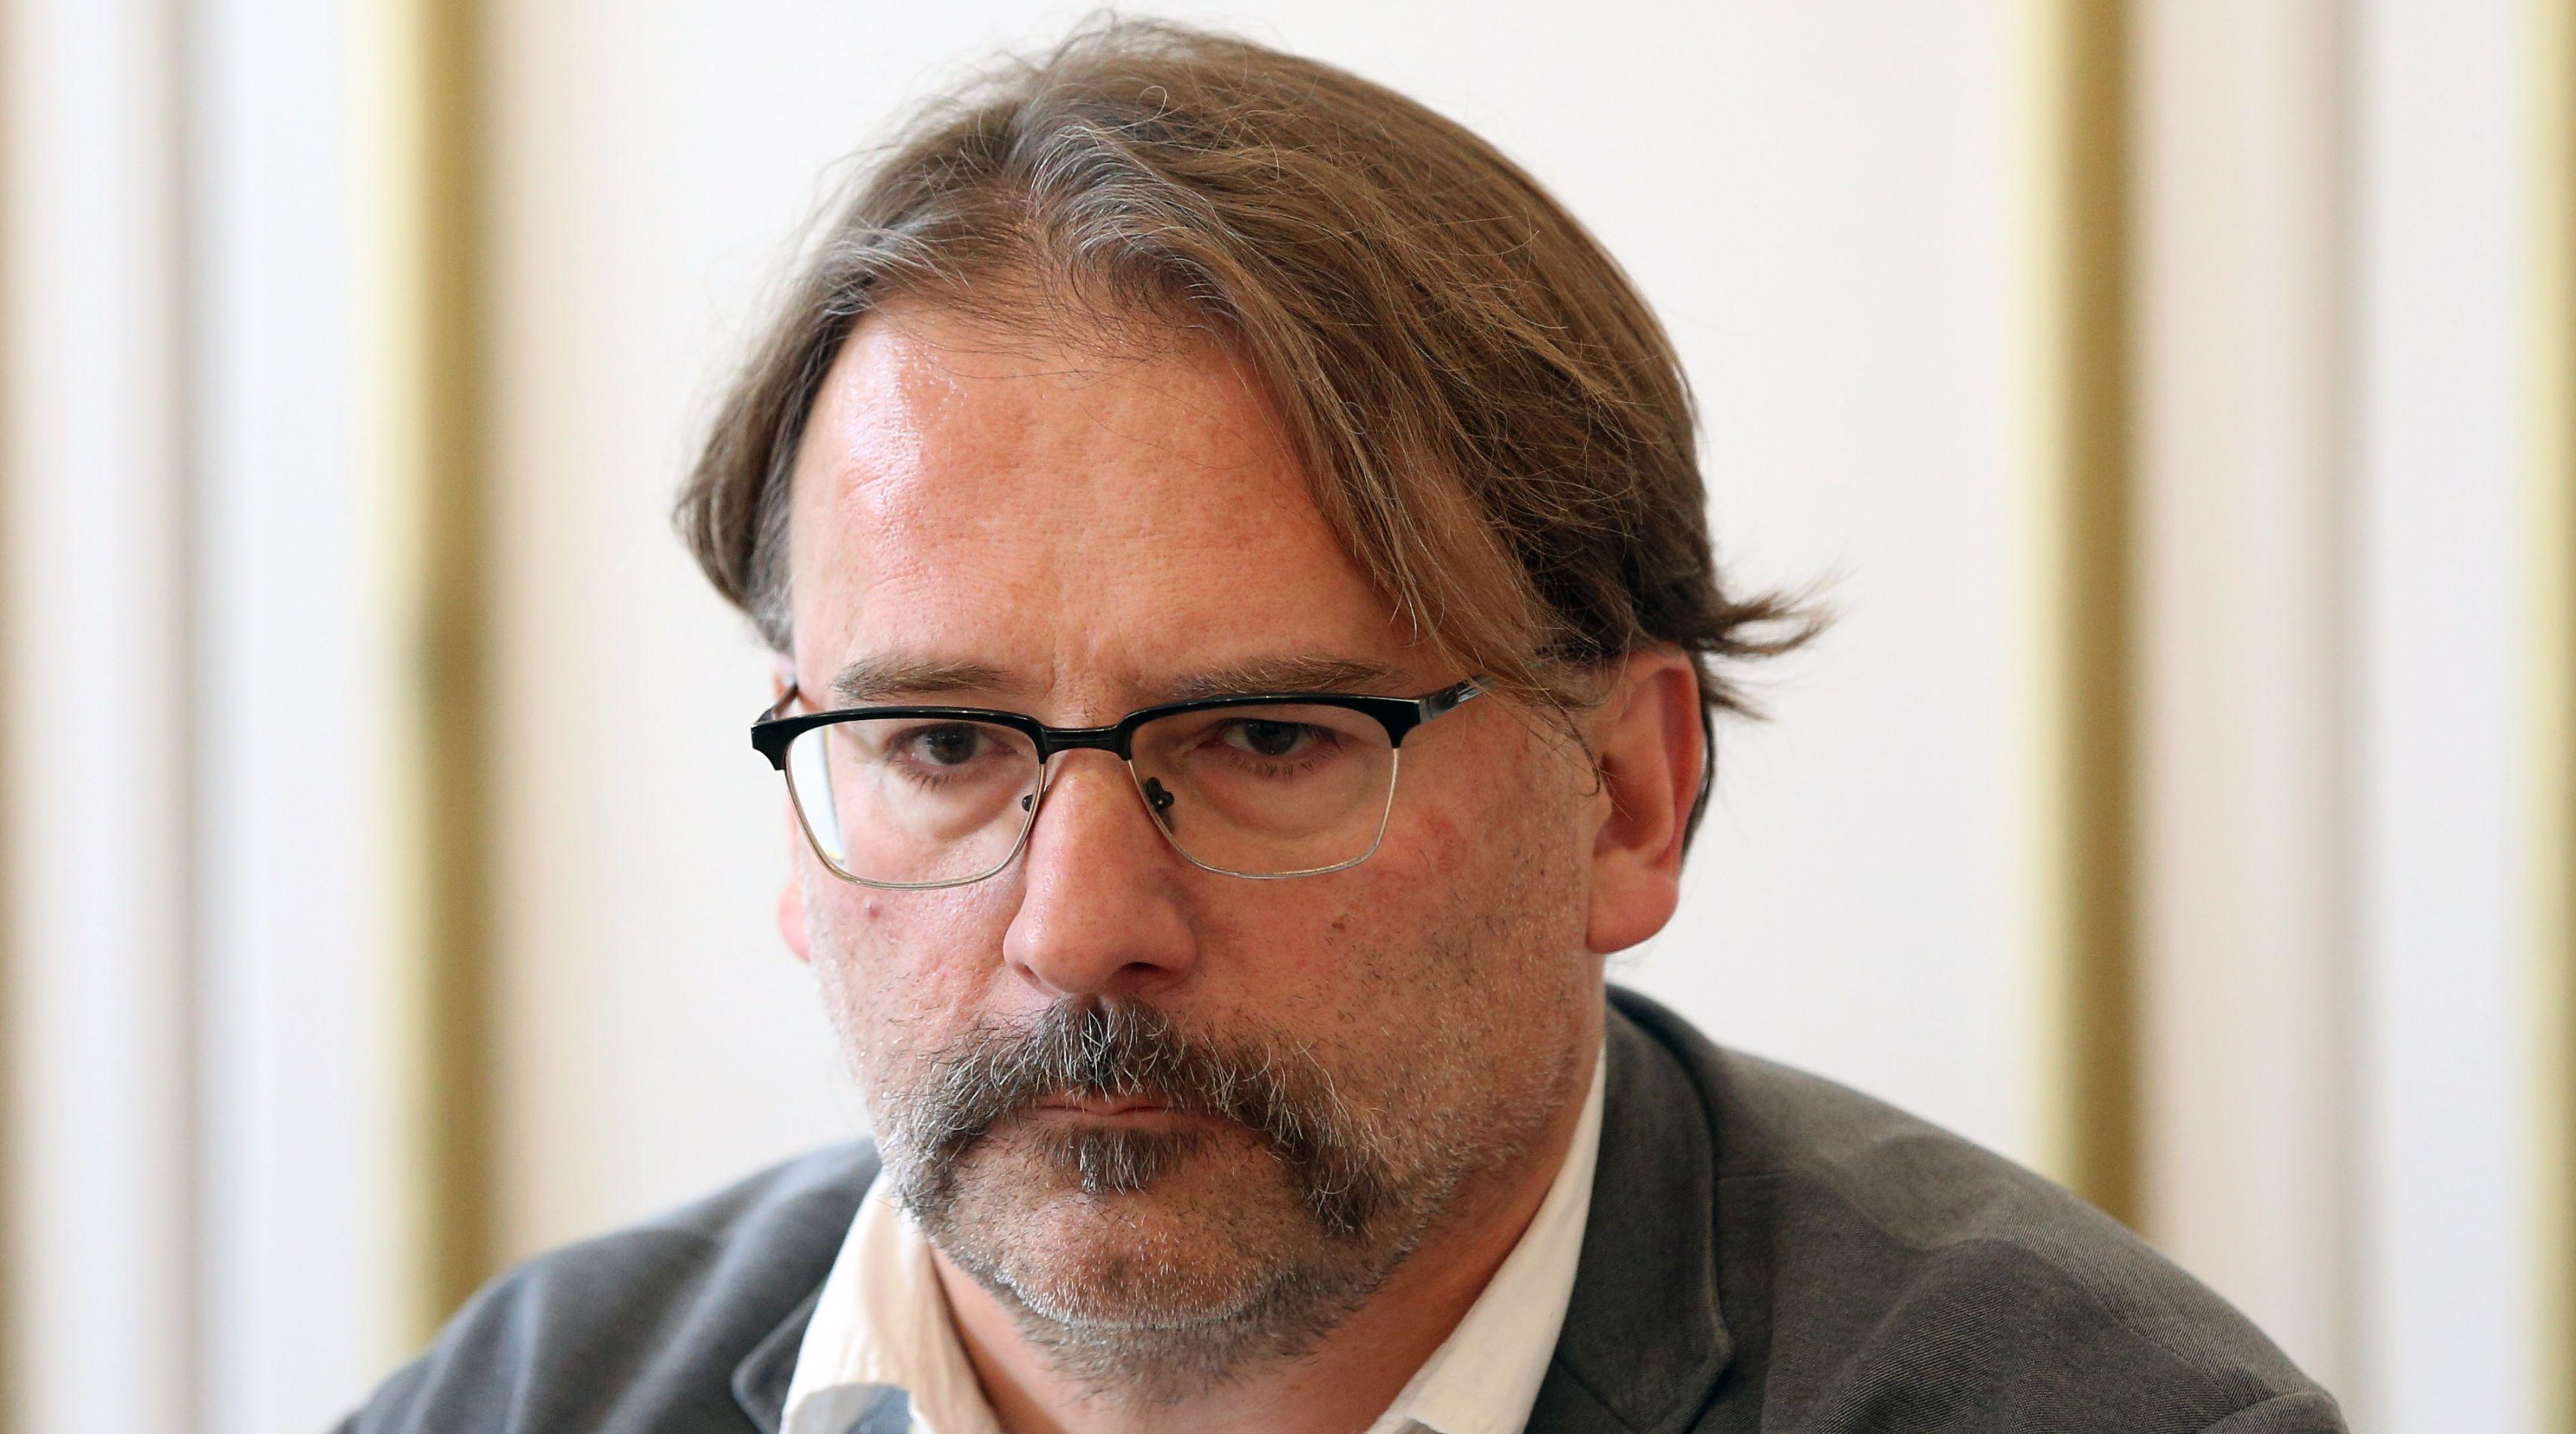 Hribar podnio ostavku na dužnost ravnatelja HAVC-a